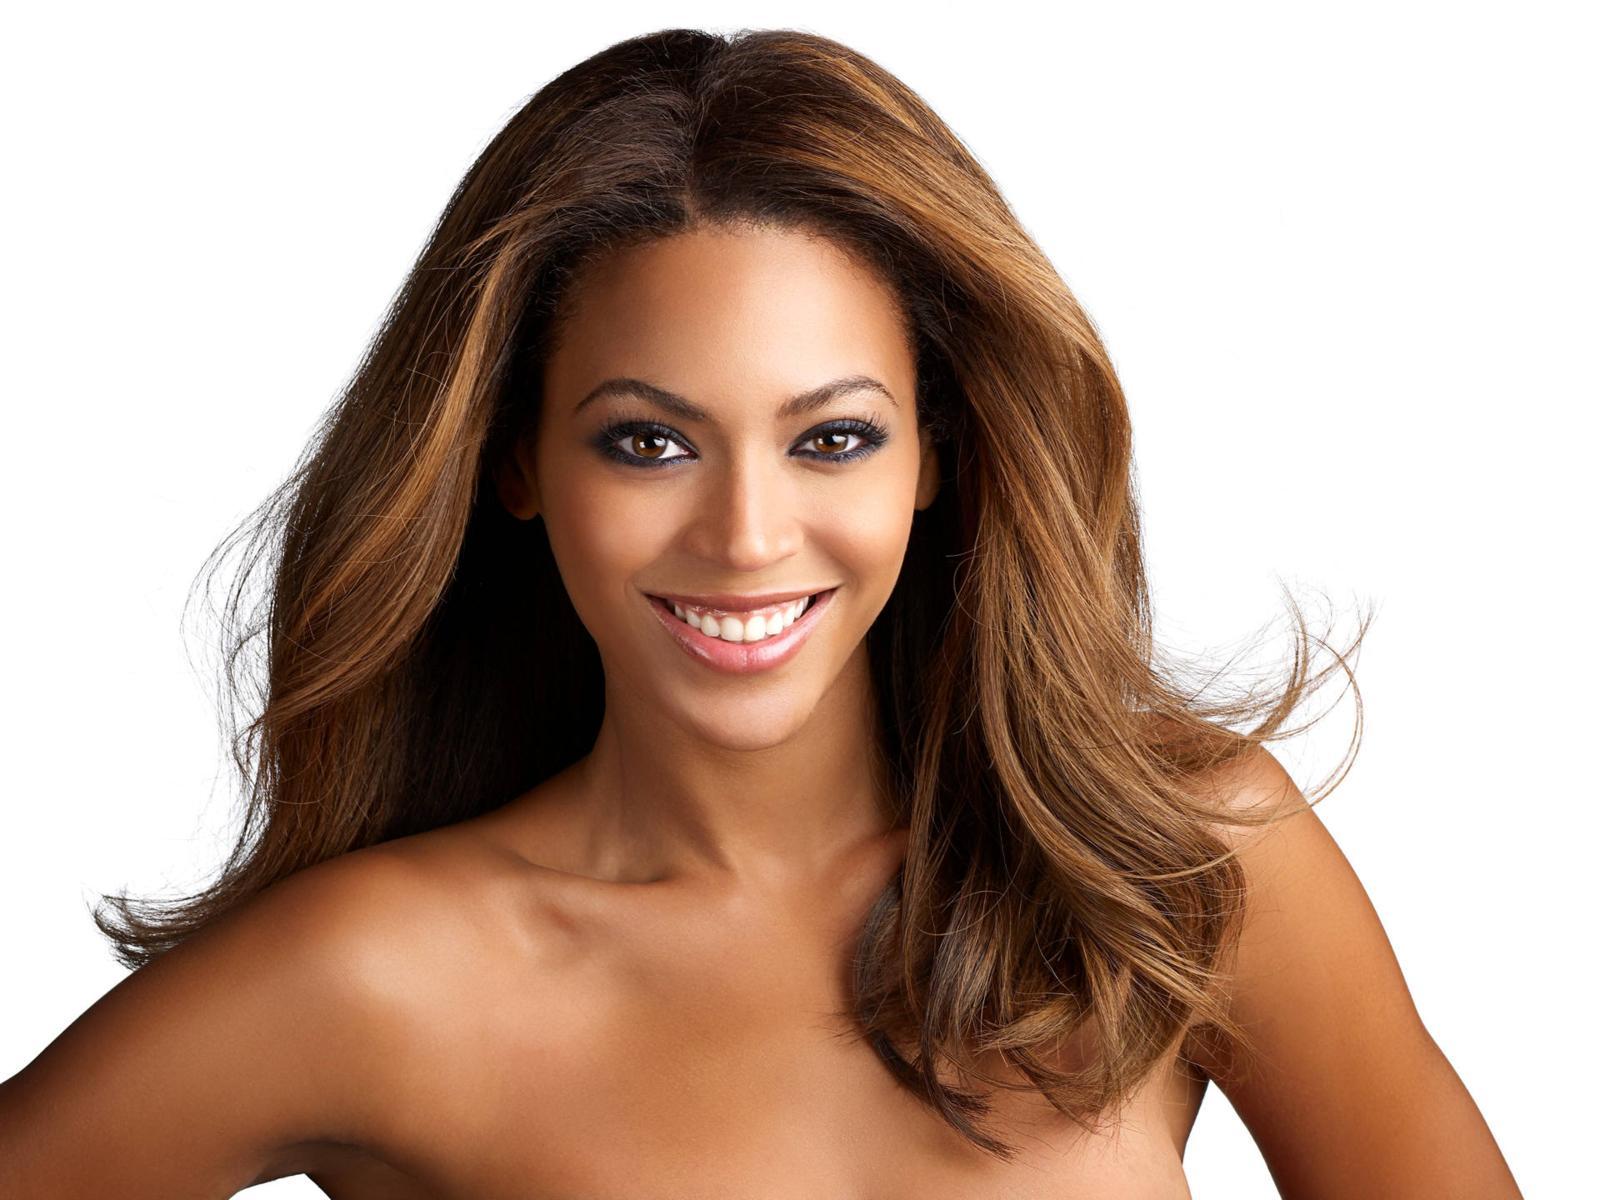 http://3.bp.blogspot.com/-nCT9dZpgN50/Ti9xaxVJn8I/AAAAAAAABYA/qJ09yJ4QgW0/s1600/Celebrities+SeasonalColorAnalysis+Beyonce.png